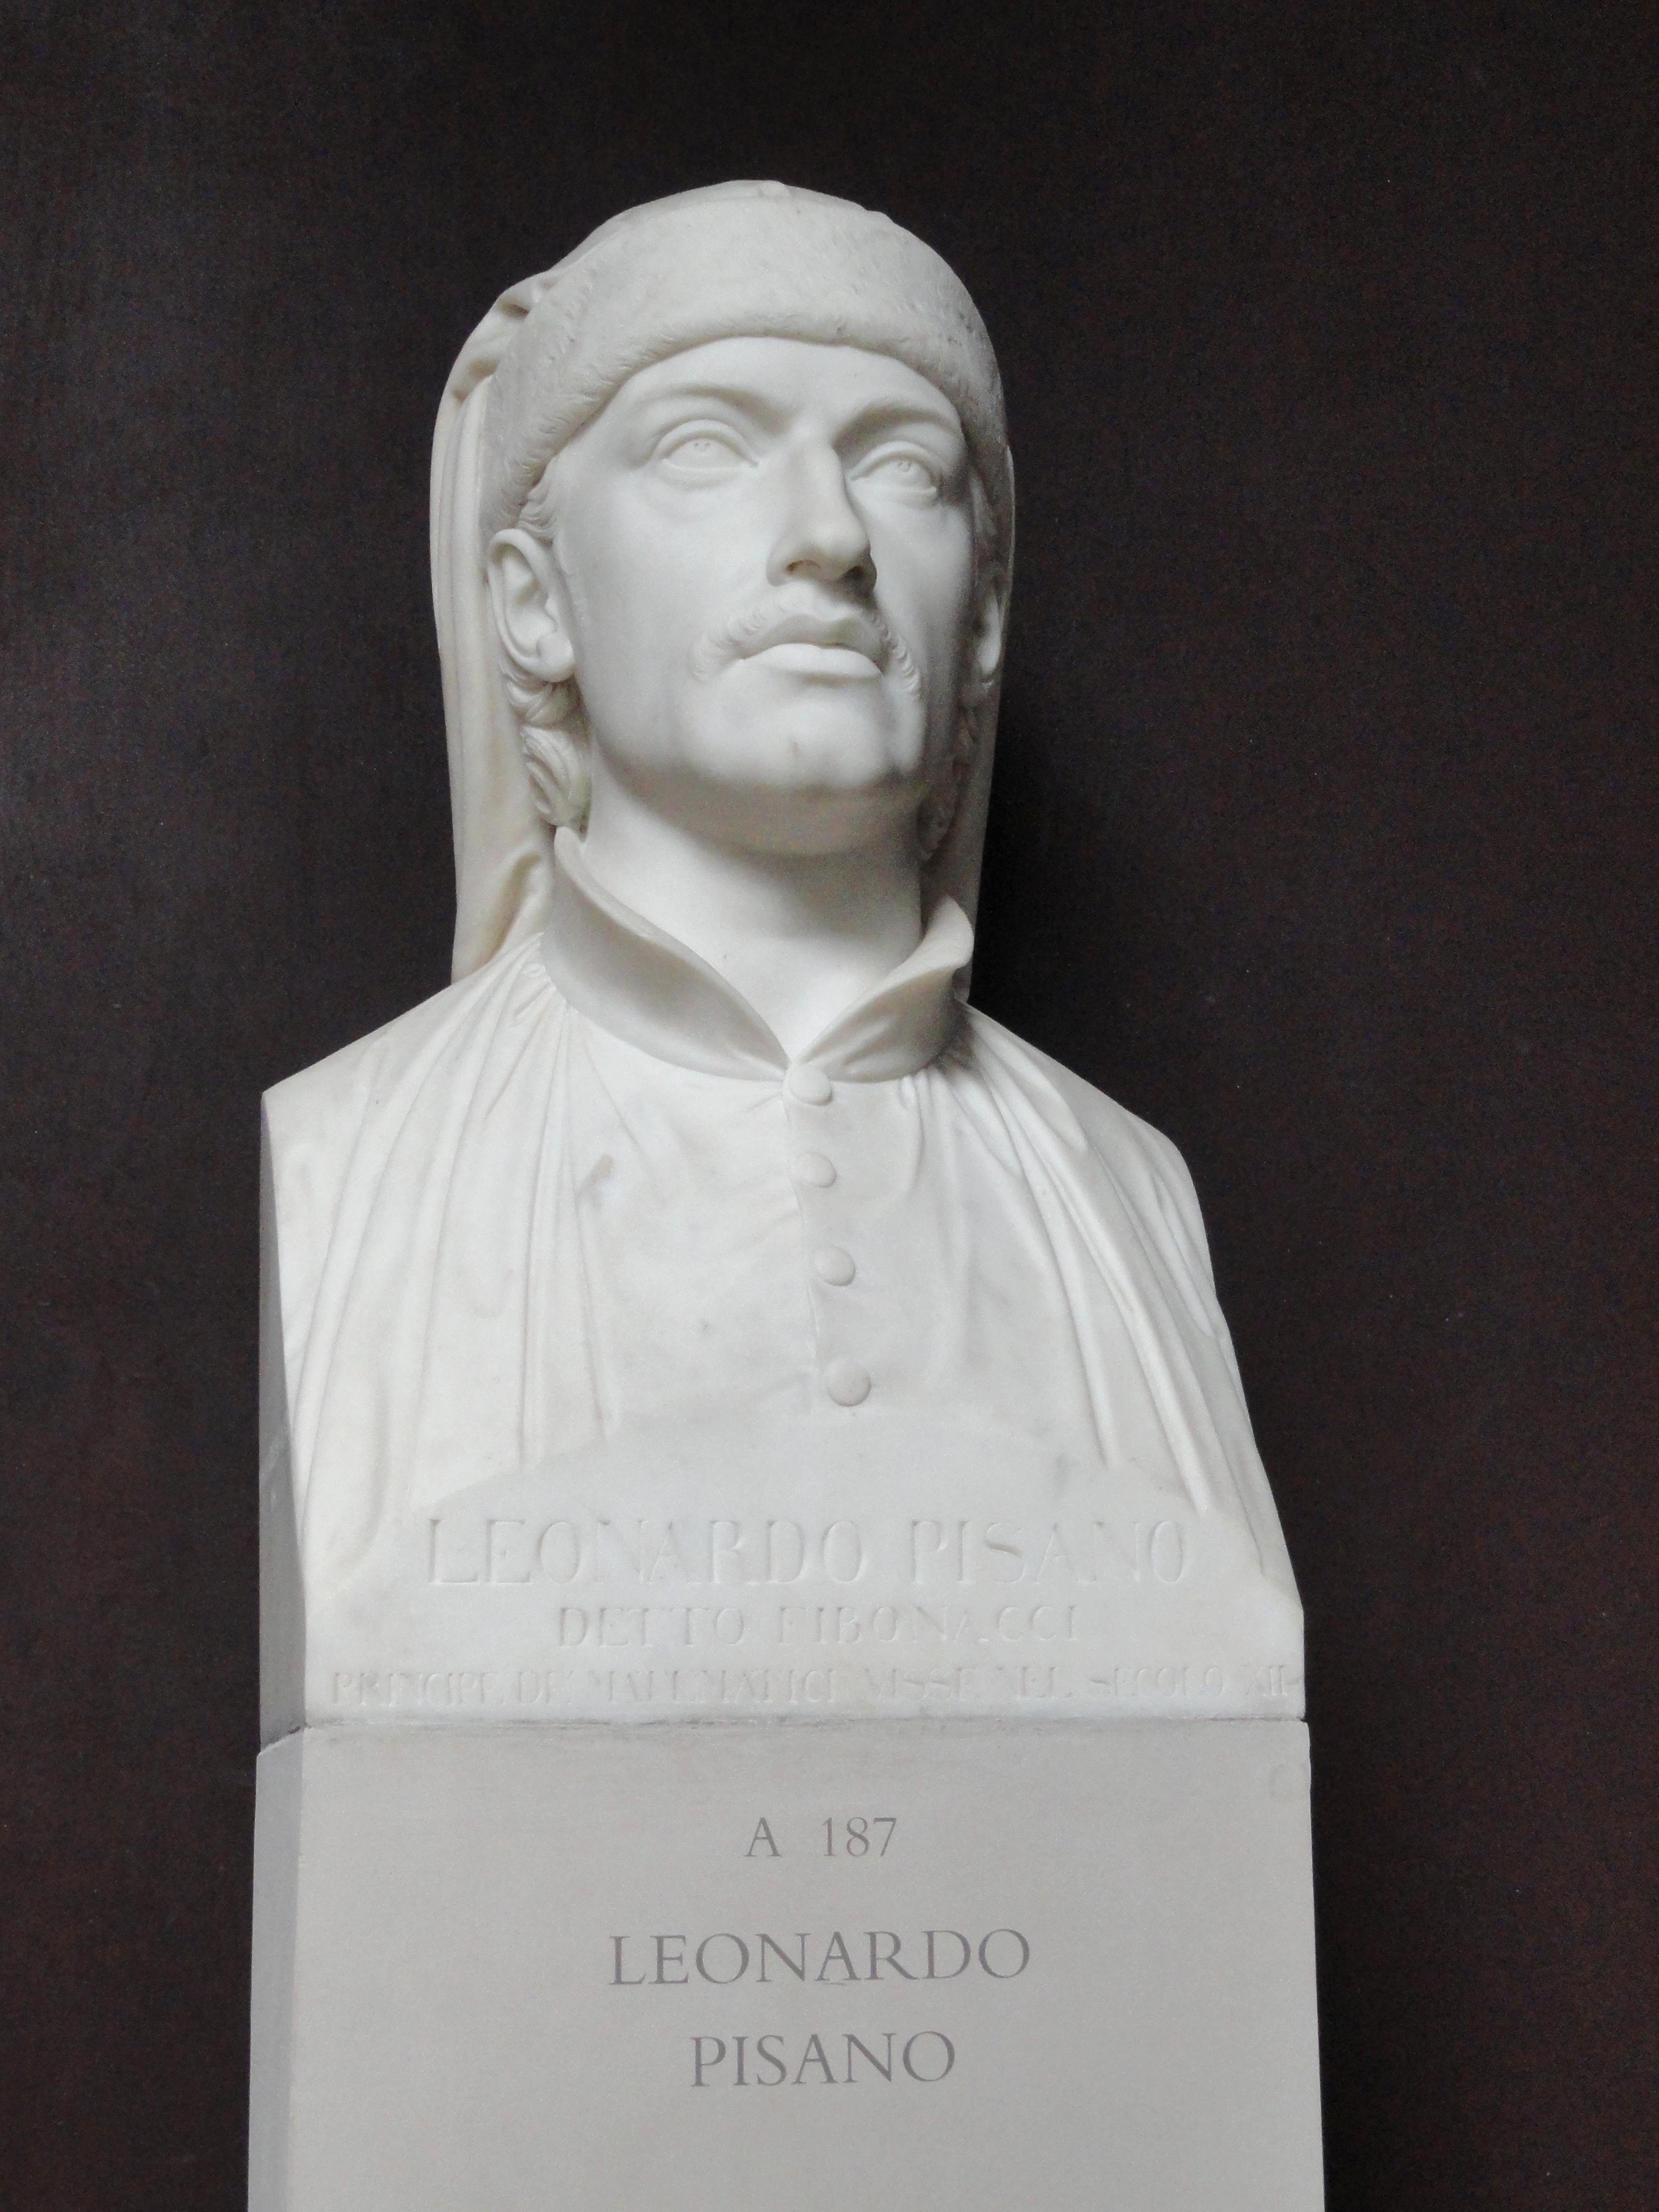 File:leonardo pisano thorvaldsens museum dsc08548. Jpg.